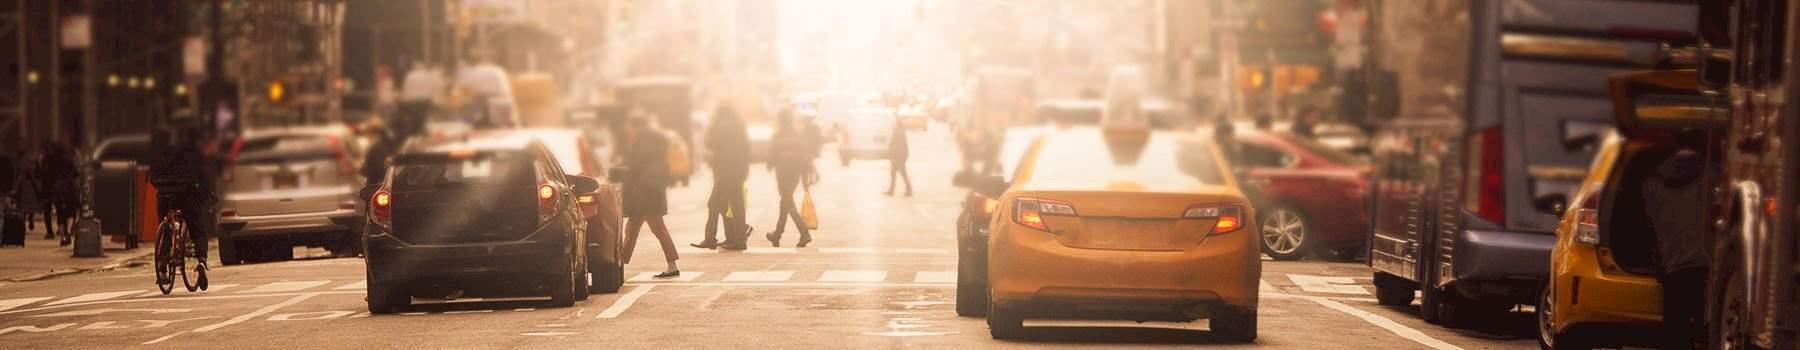 Explore Neighborhood at WJ Hotel Newyork